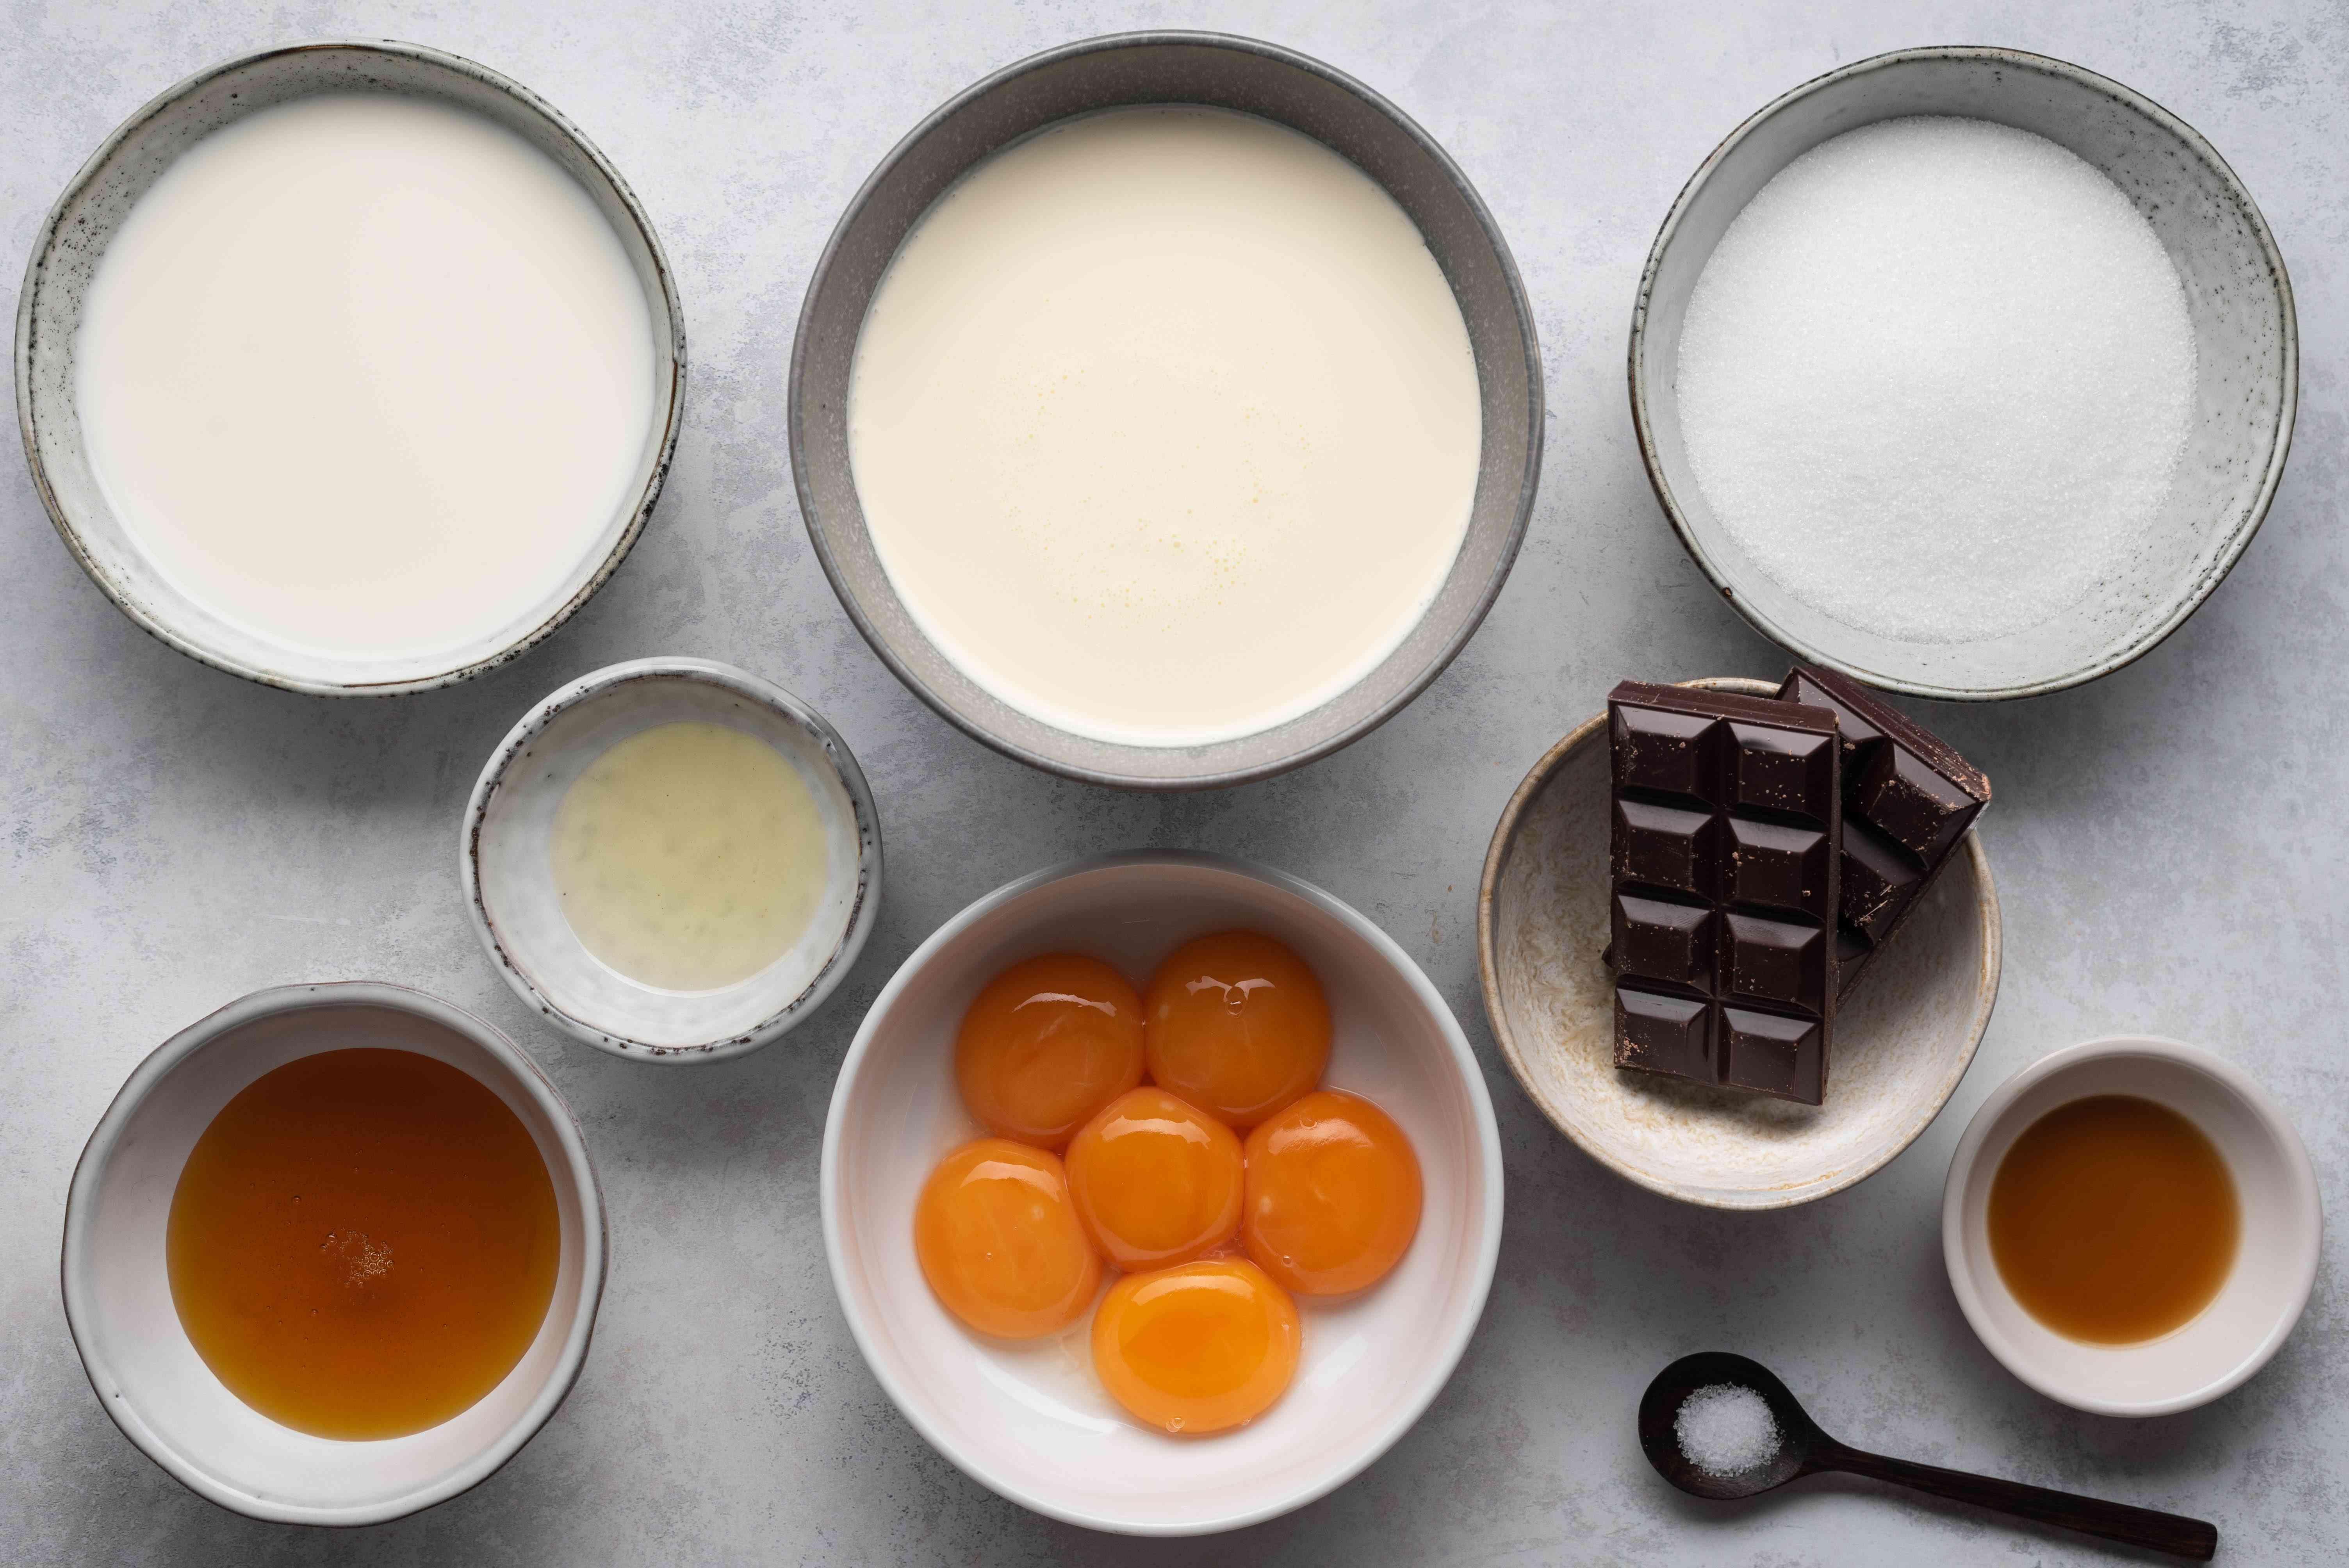 Chocolate Chip Ice Cream ingredients